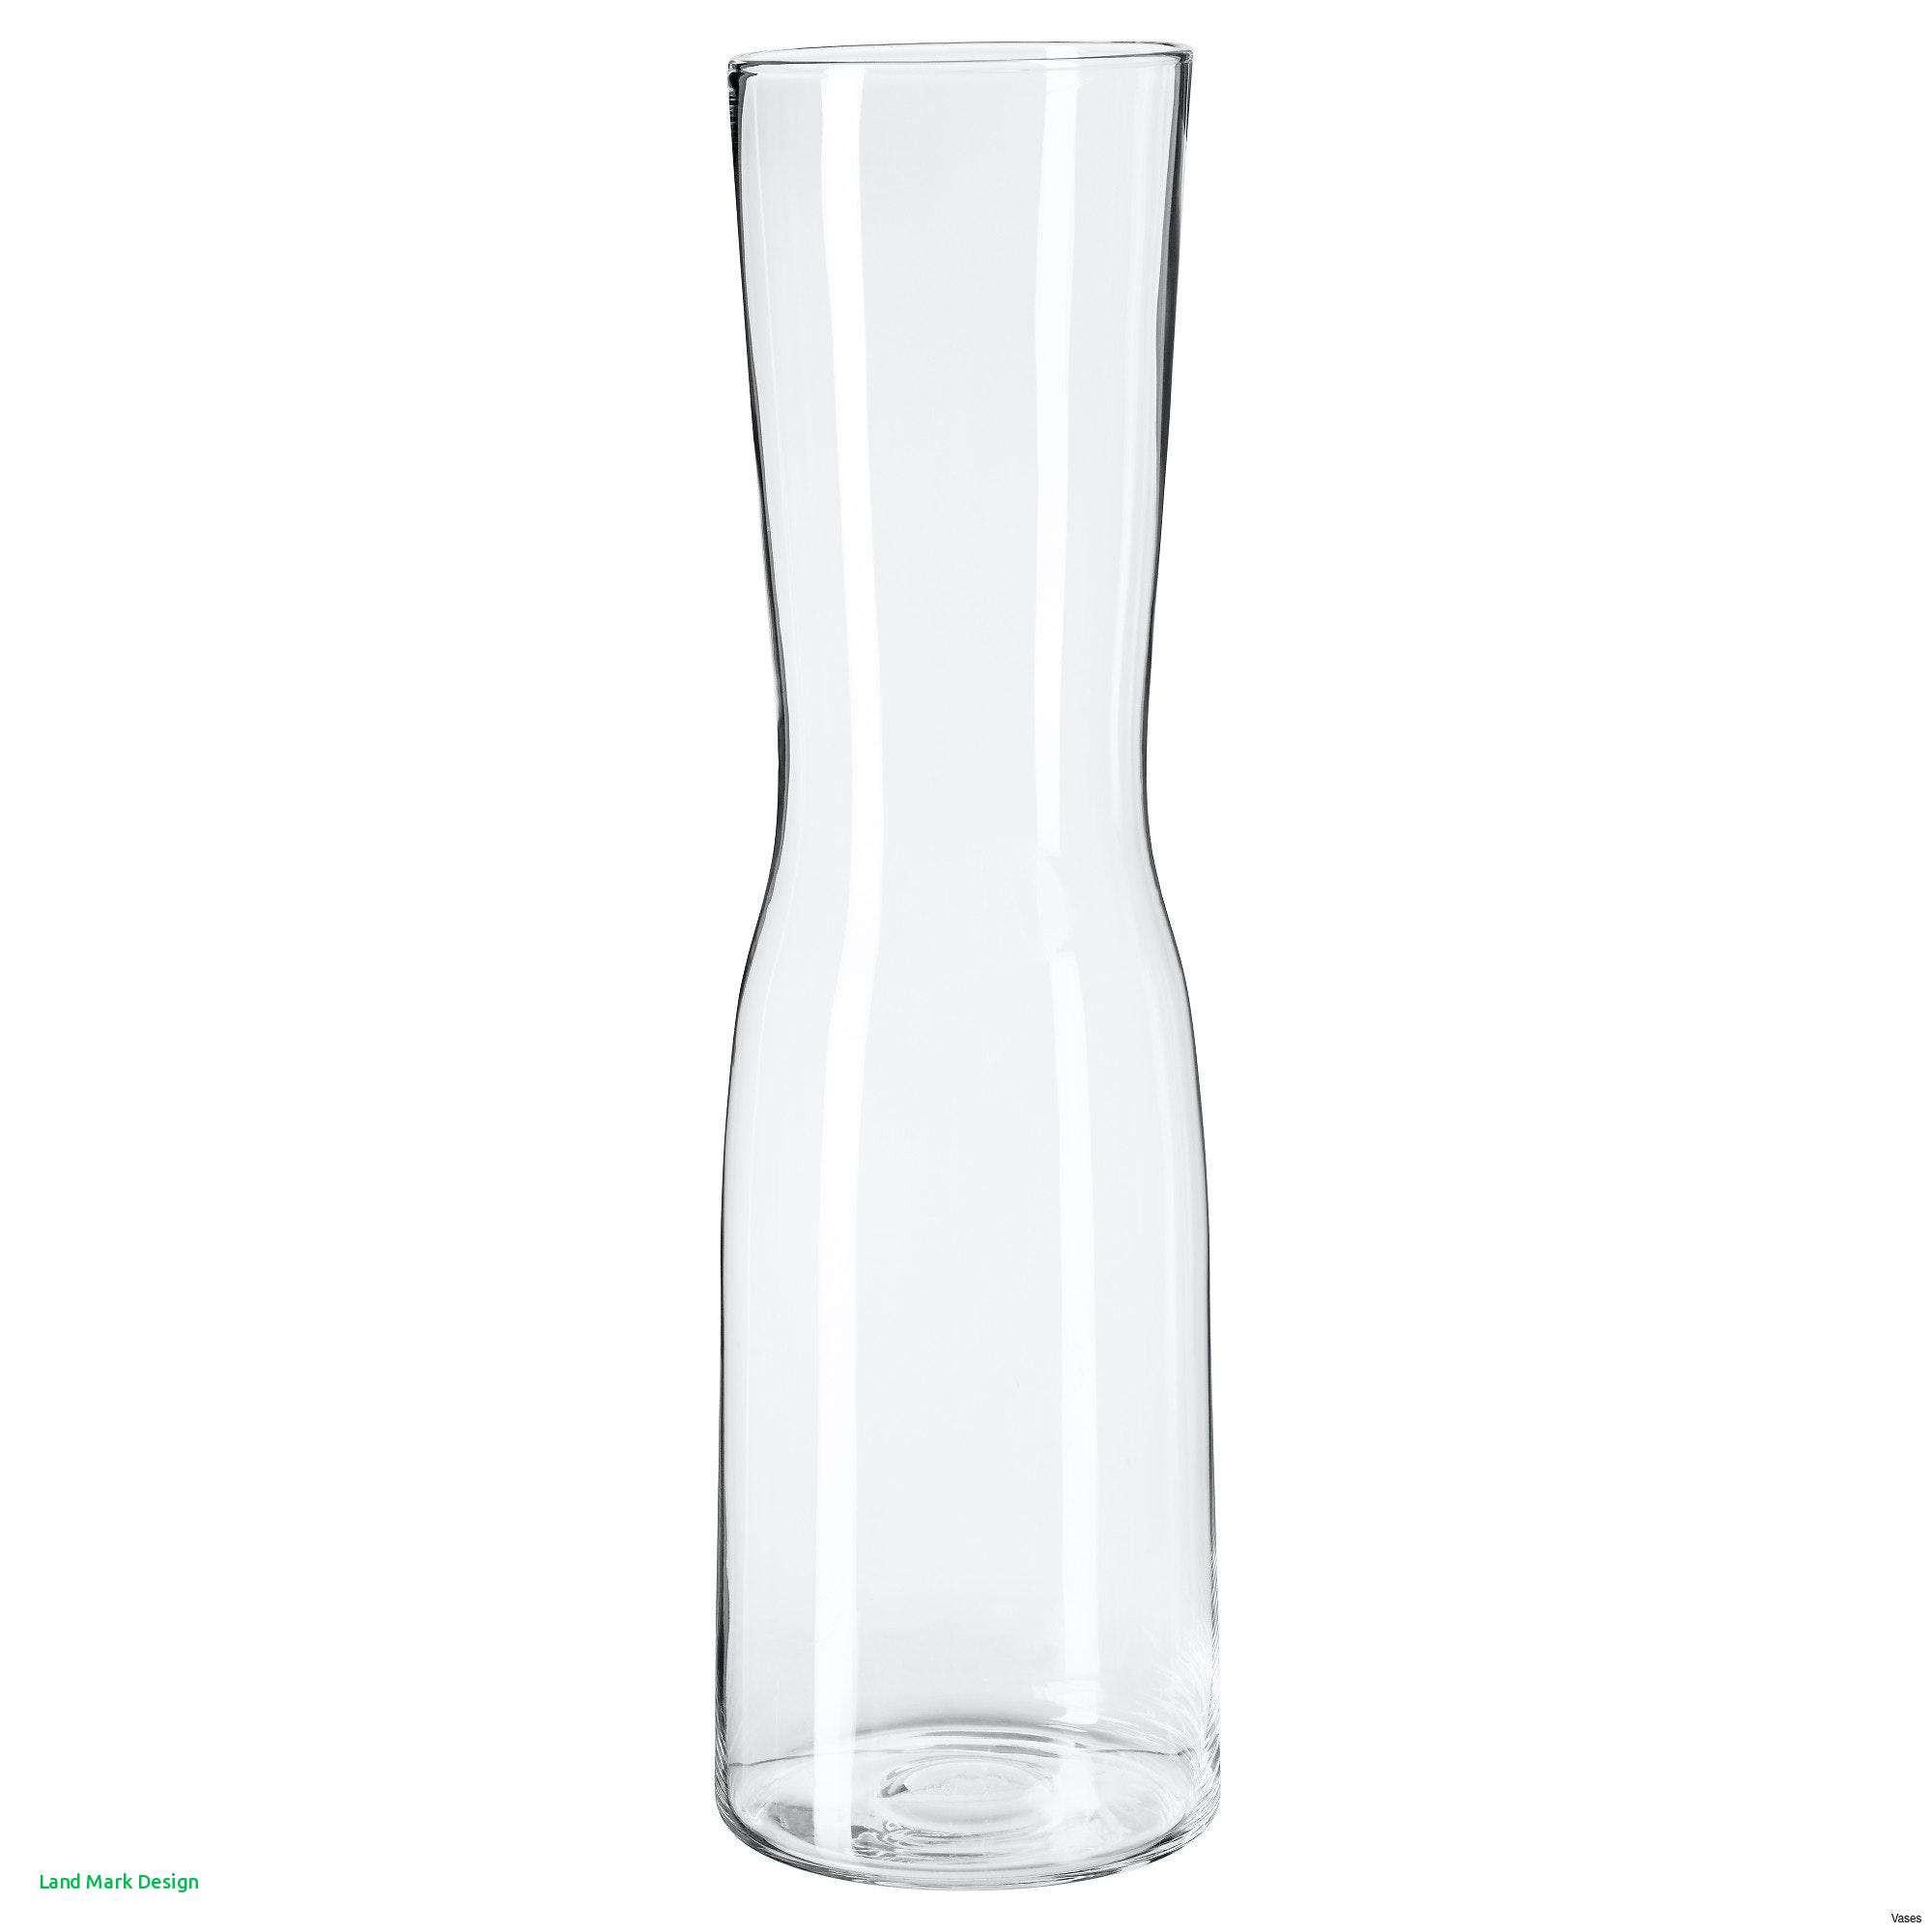 waterford blue vase of large white vases images ikea vase vases artificial plants throughout ikea vase